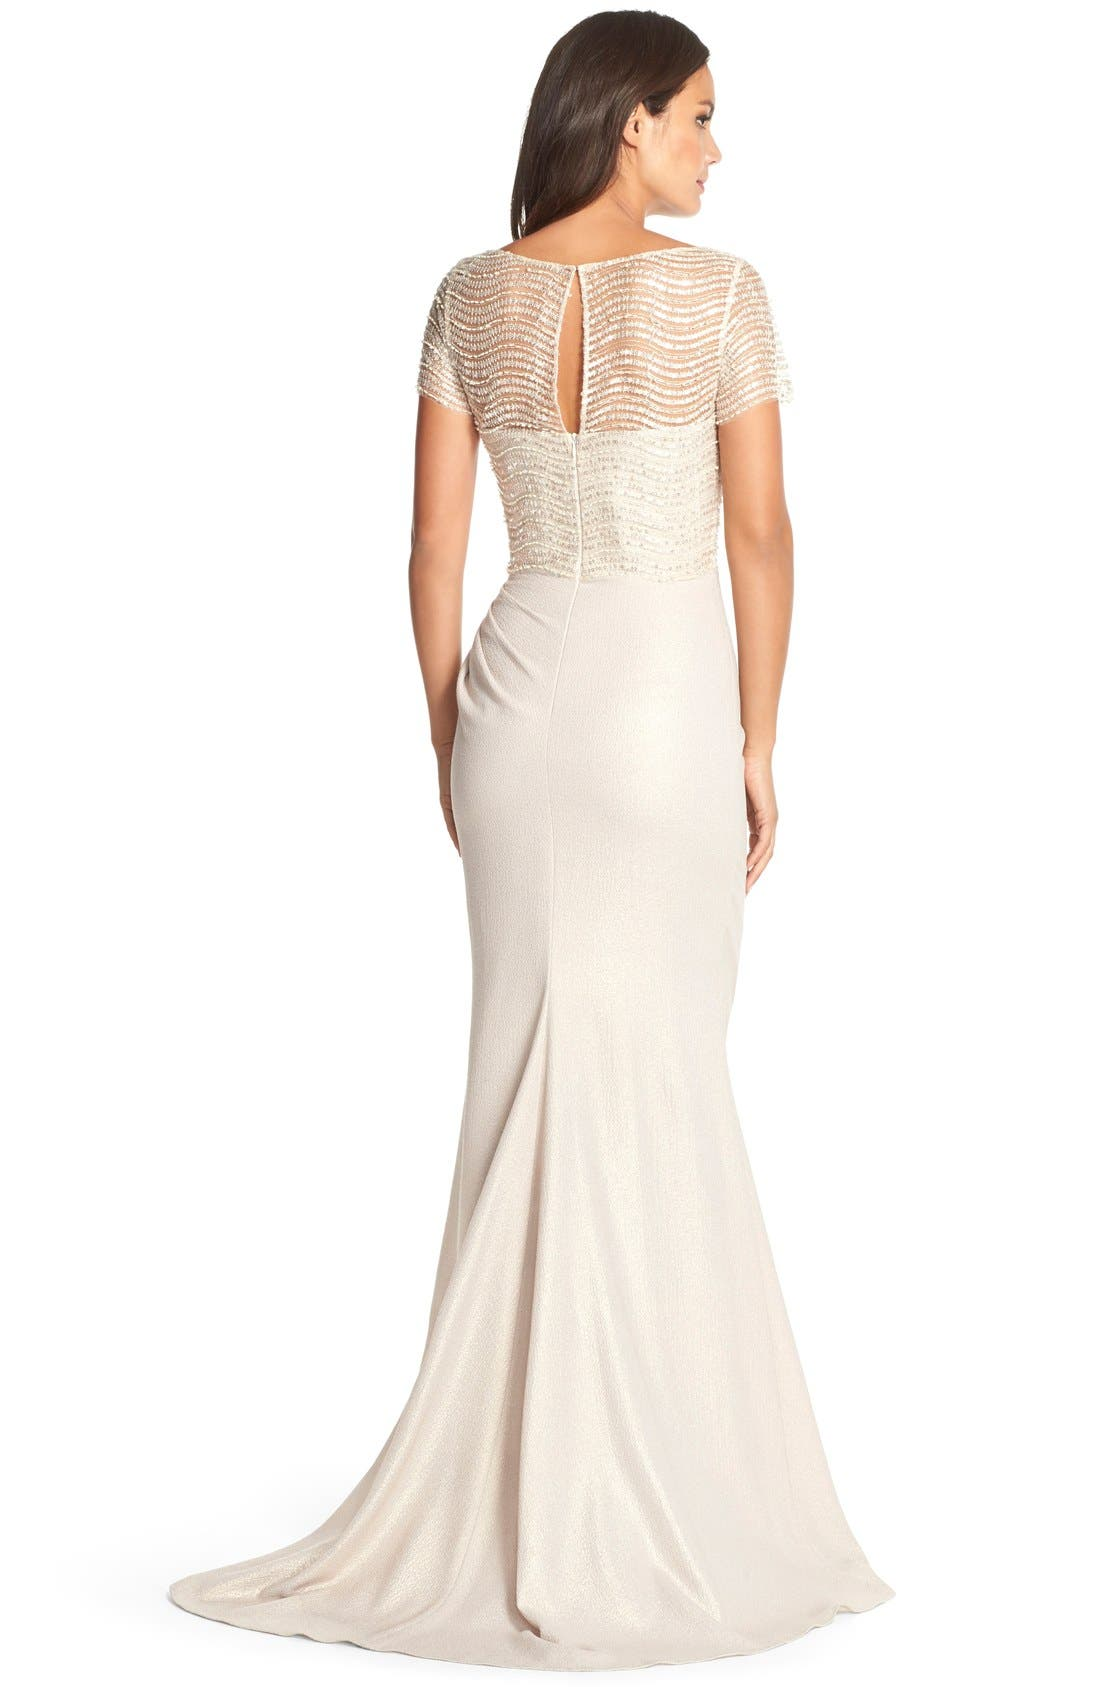 Alternate Image 2  - Badgley Mischka Embellished Illusion Crepe Gown